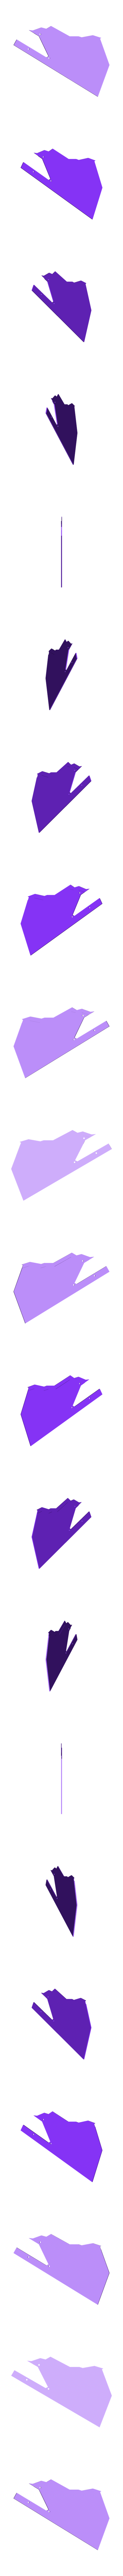 blade_right1.stl Download free STL file Guardian Shield+ Zelda Breath of the Wild • 3D print object, Adafruit